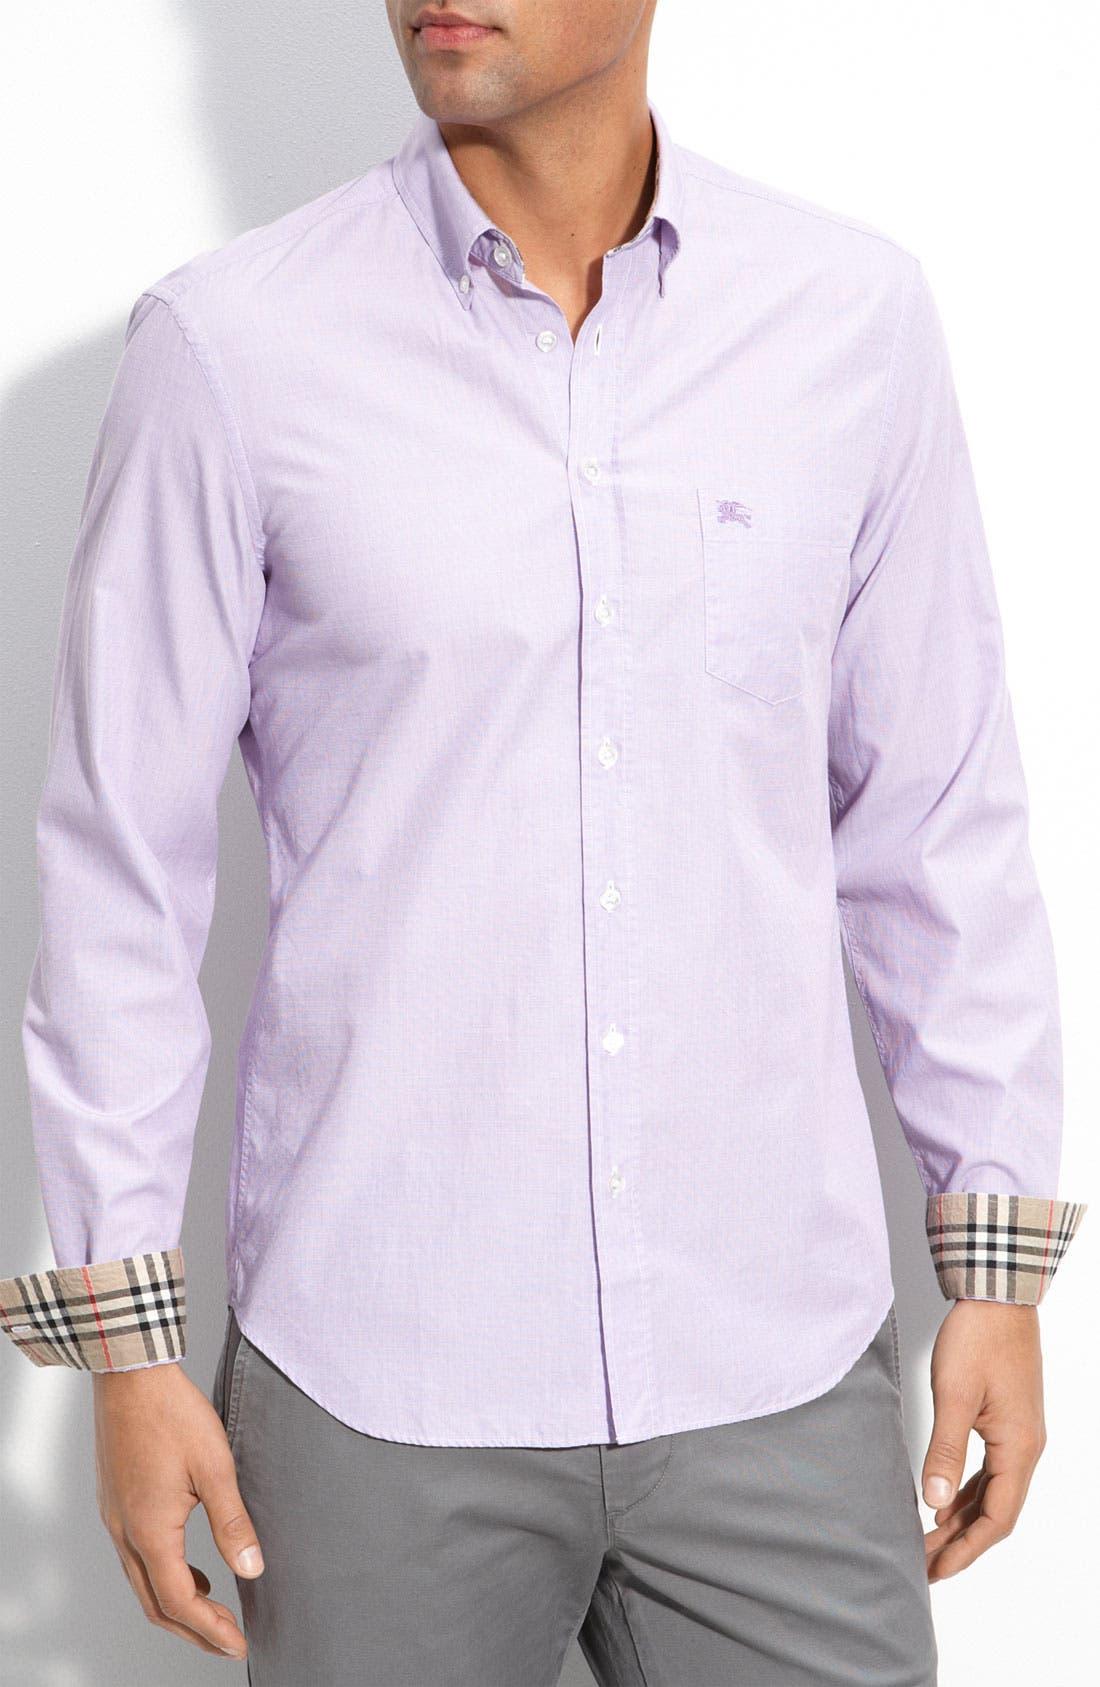 Main Image - Burberry Brit Woven Trim Fit Sport Shirt